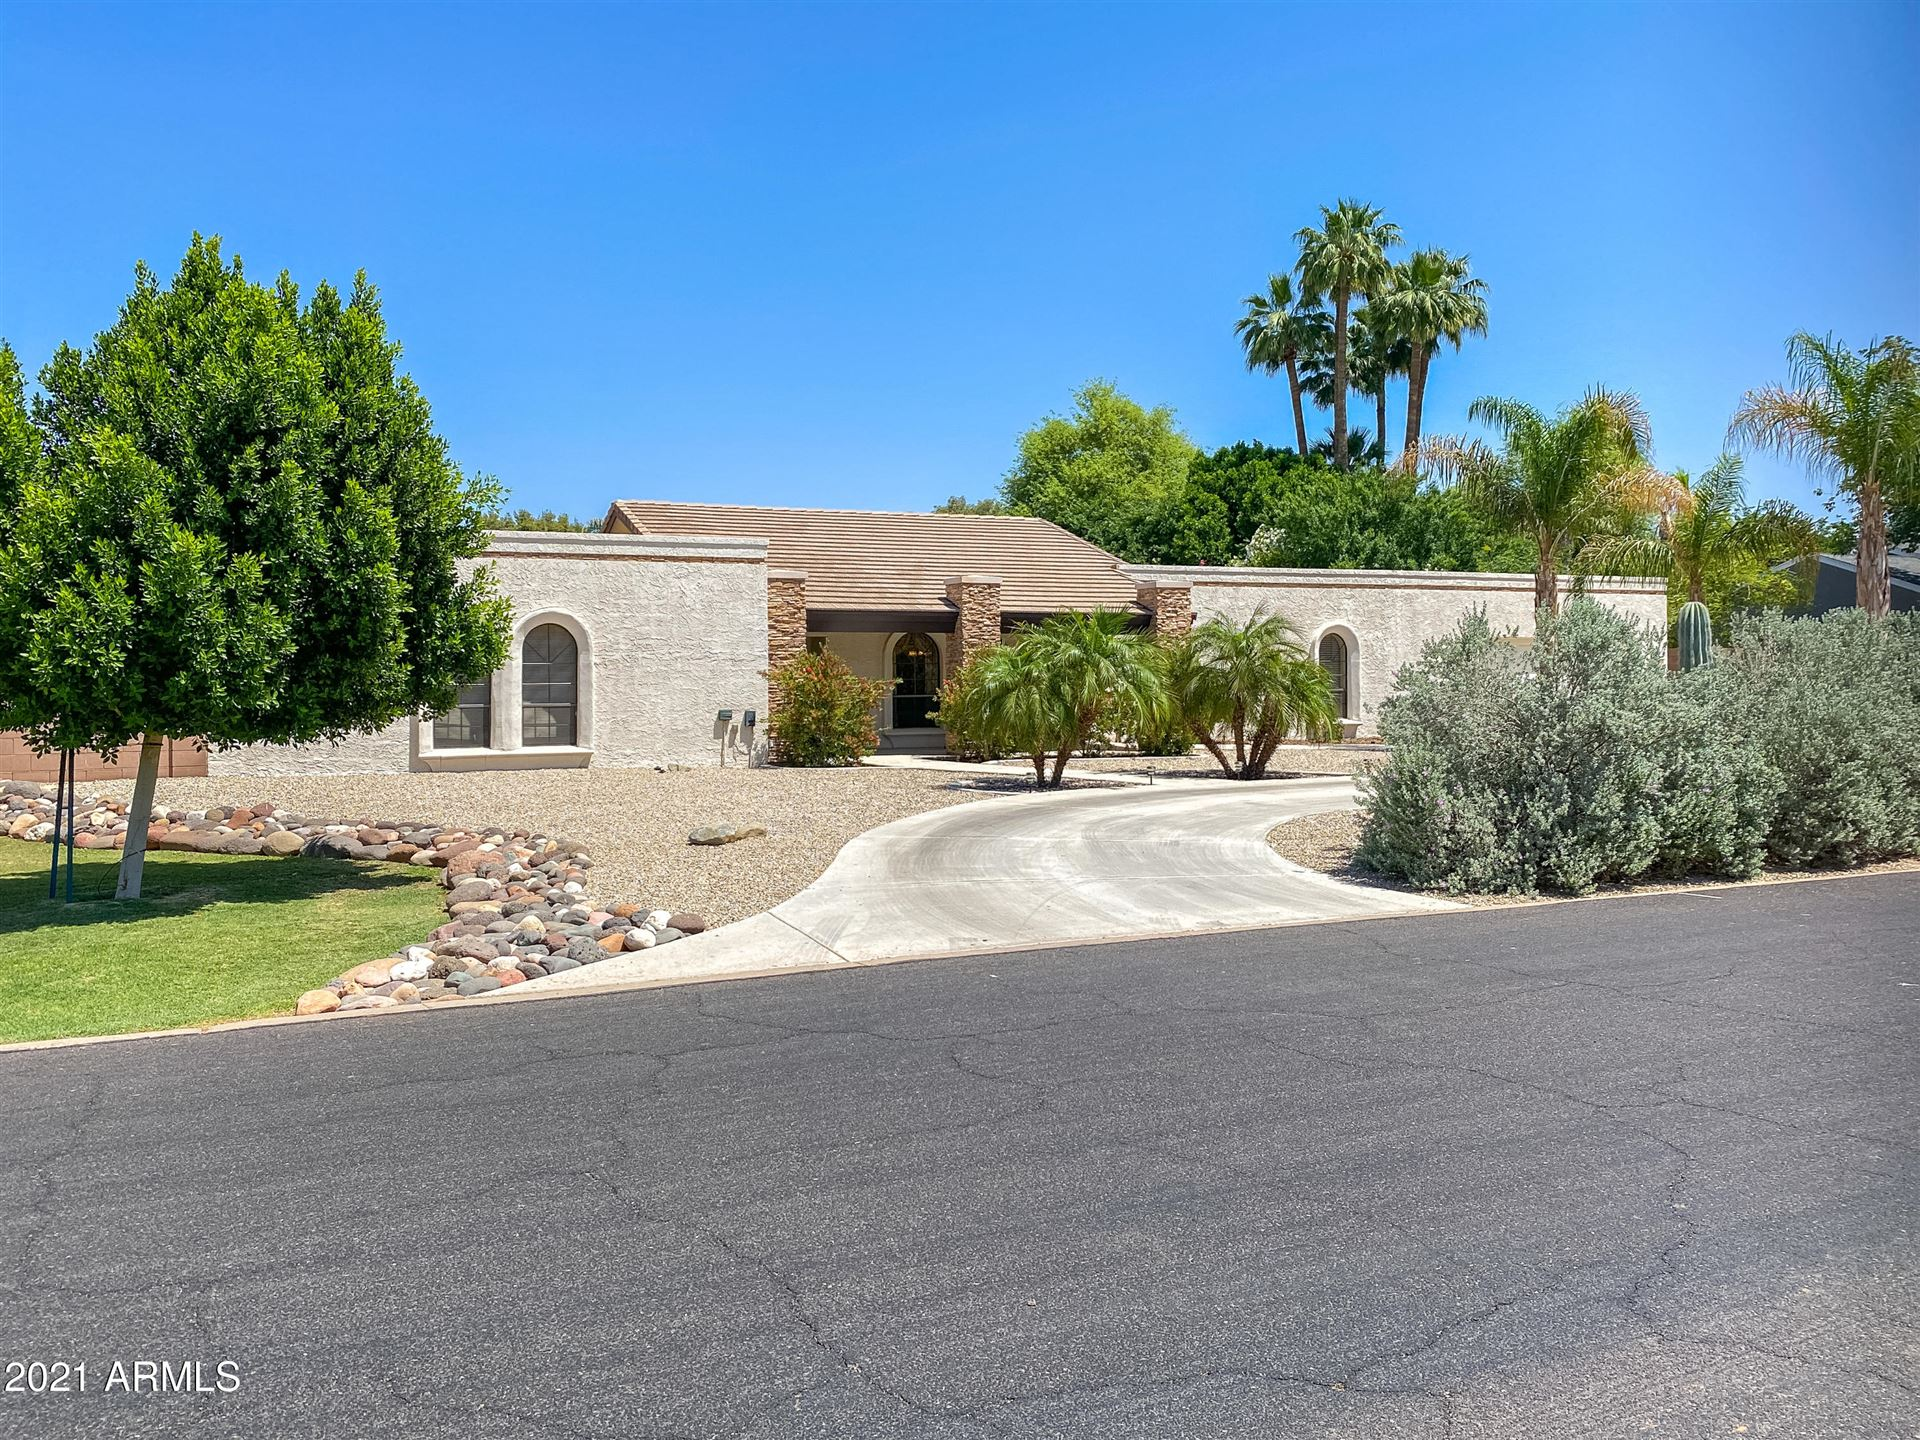 Photo of 718 E REDFIELD Road, Gilbert, AZ 85234 (MLS # 6232488)